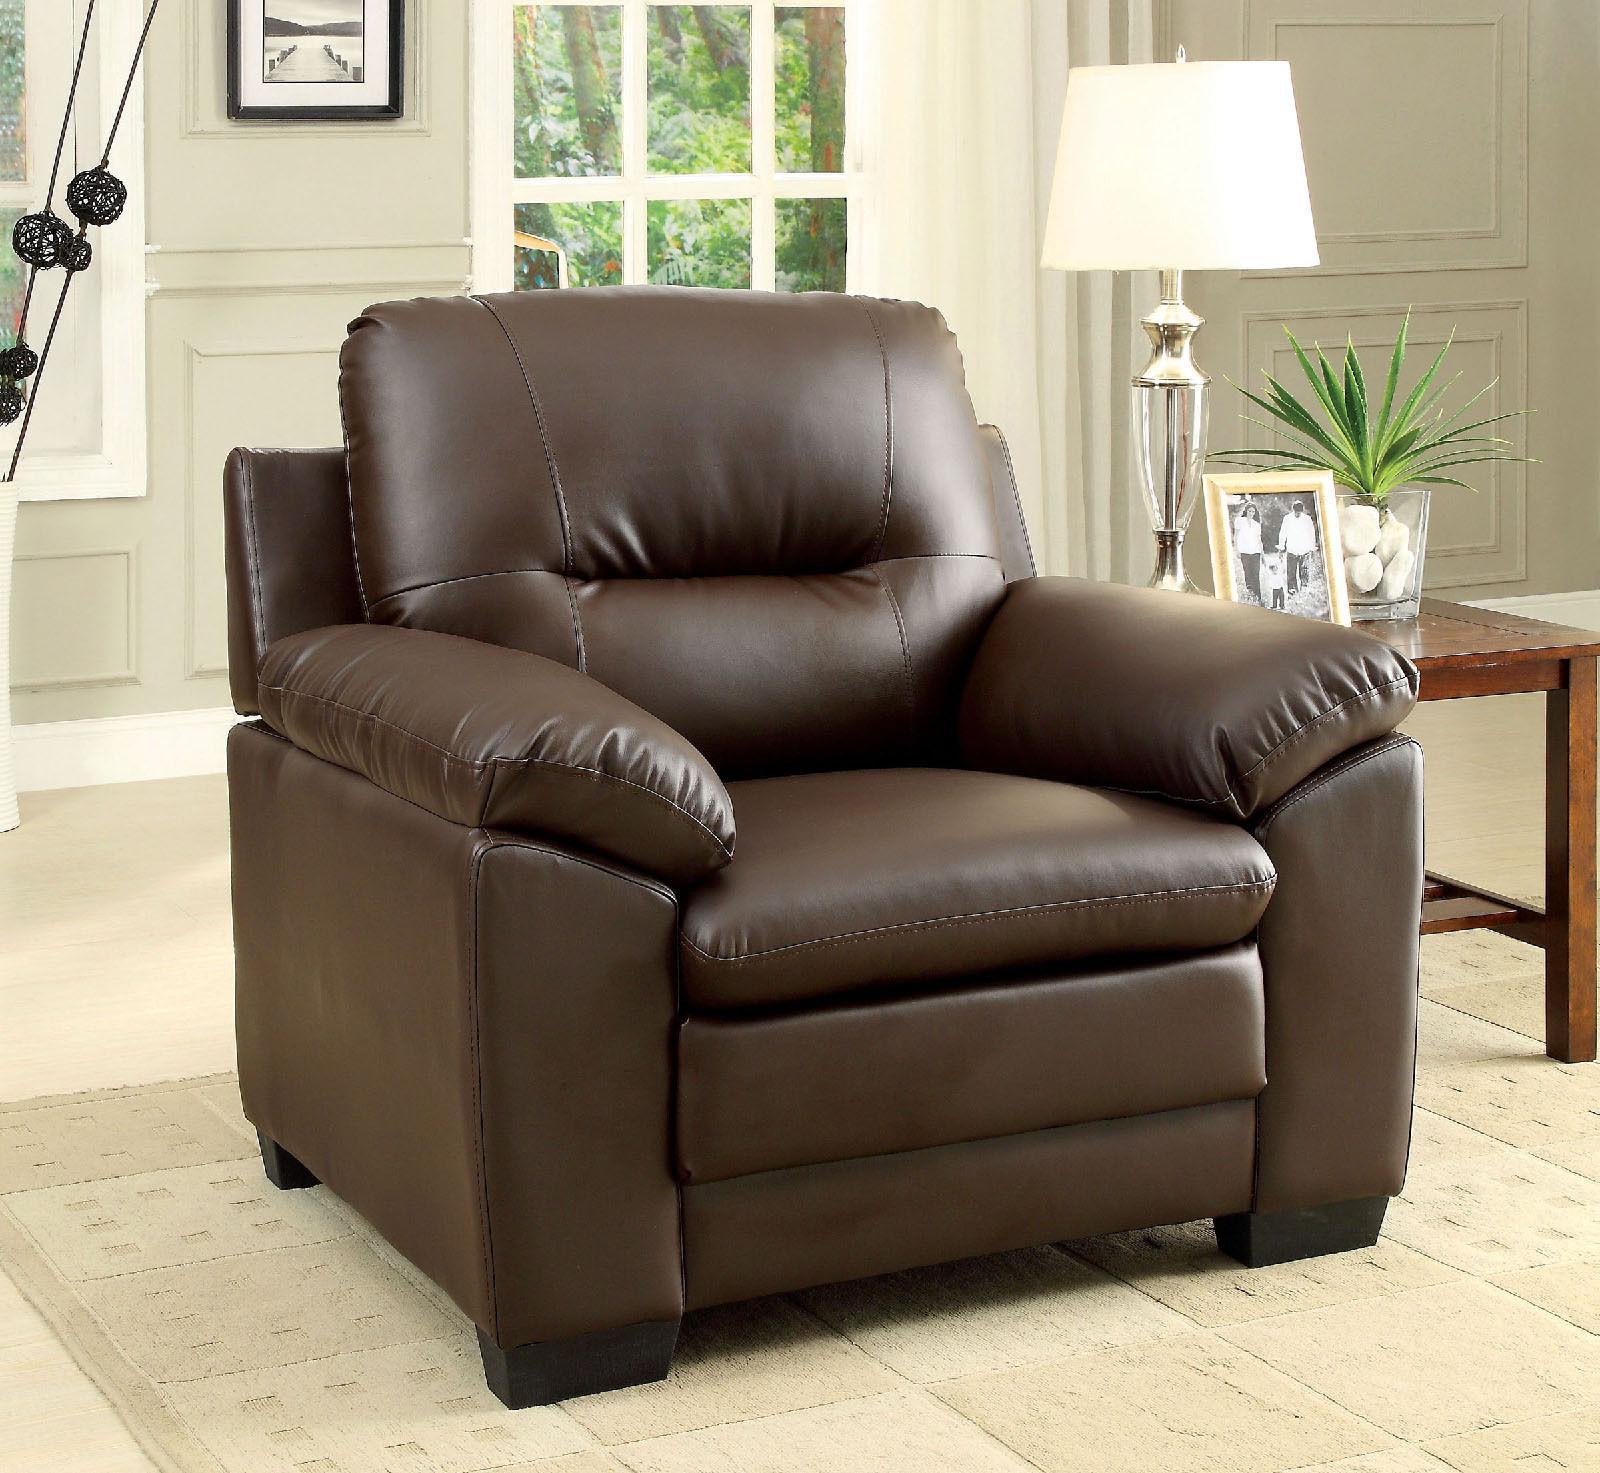 Living Modern Sofa Loveseat Chair 3pc Set Plush Seating